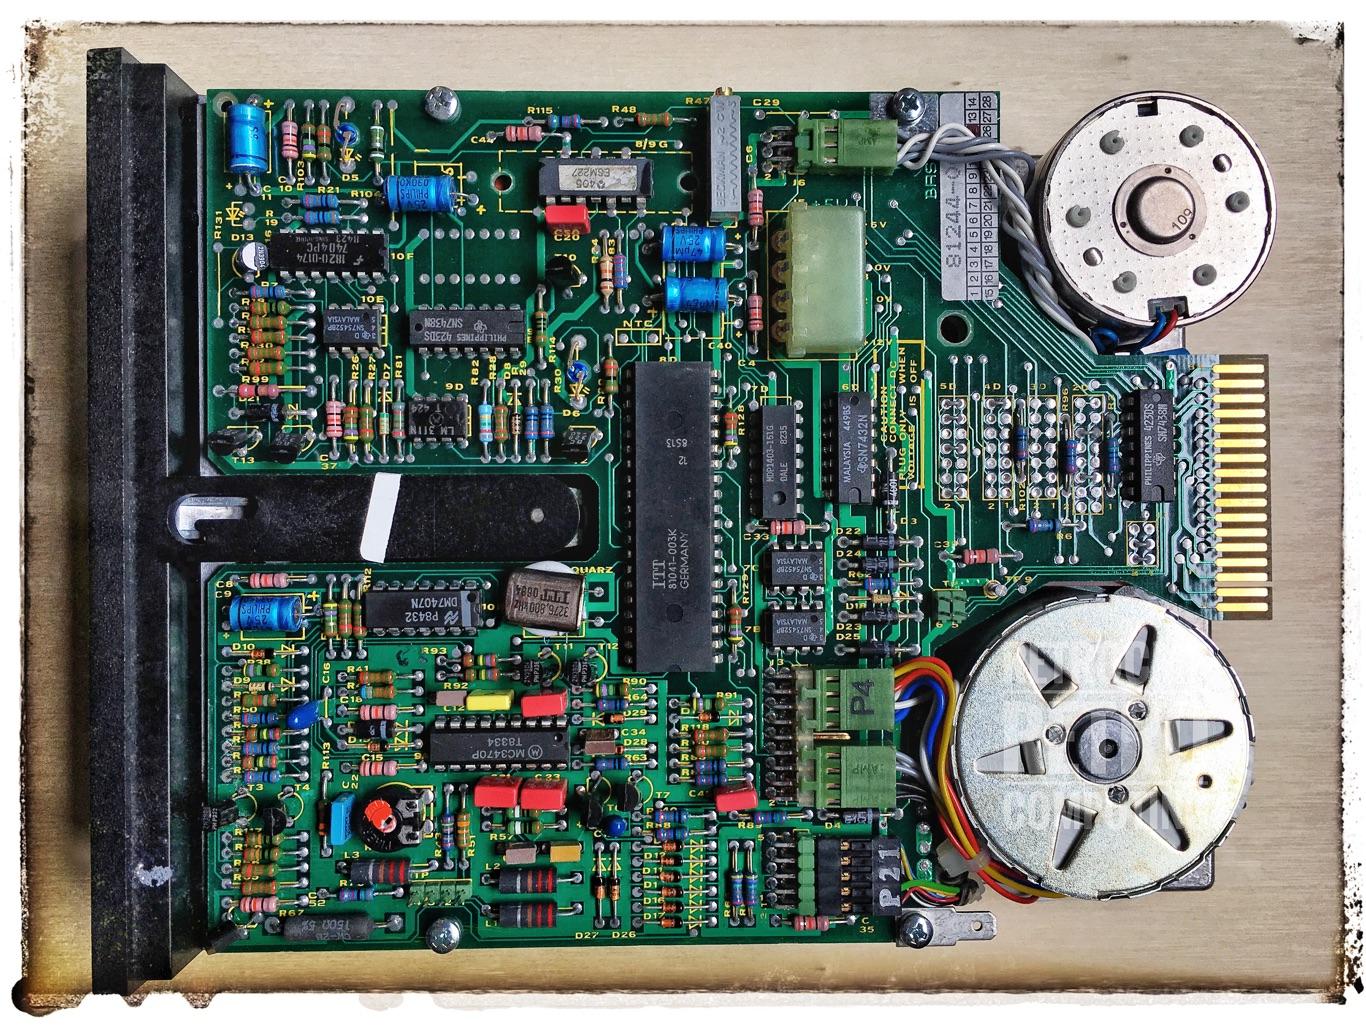 Floppy Disk Drives / Siemens, BASF 6106 / Info // retrocmp